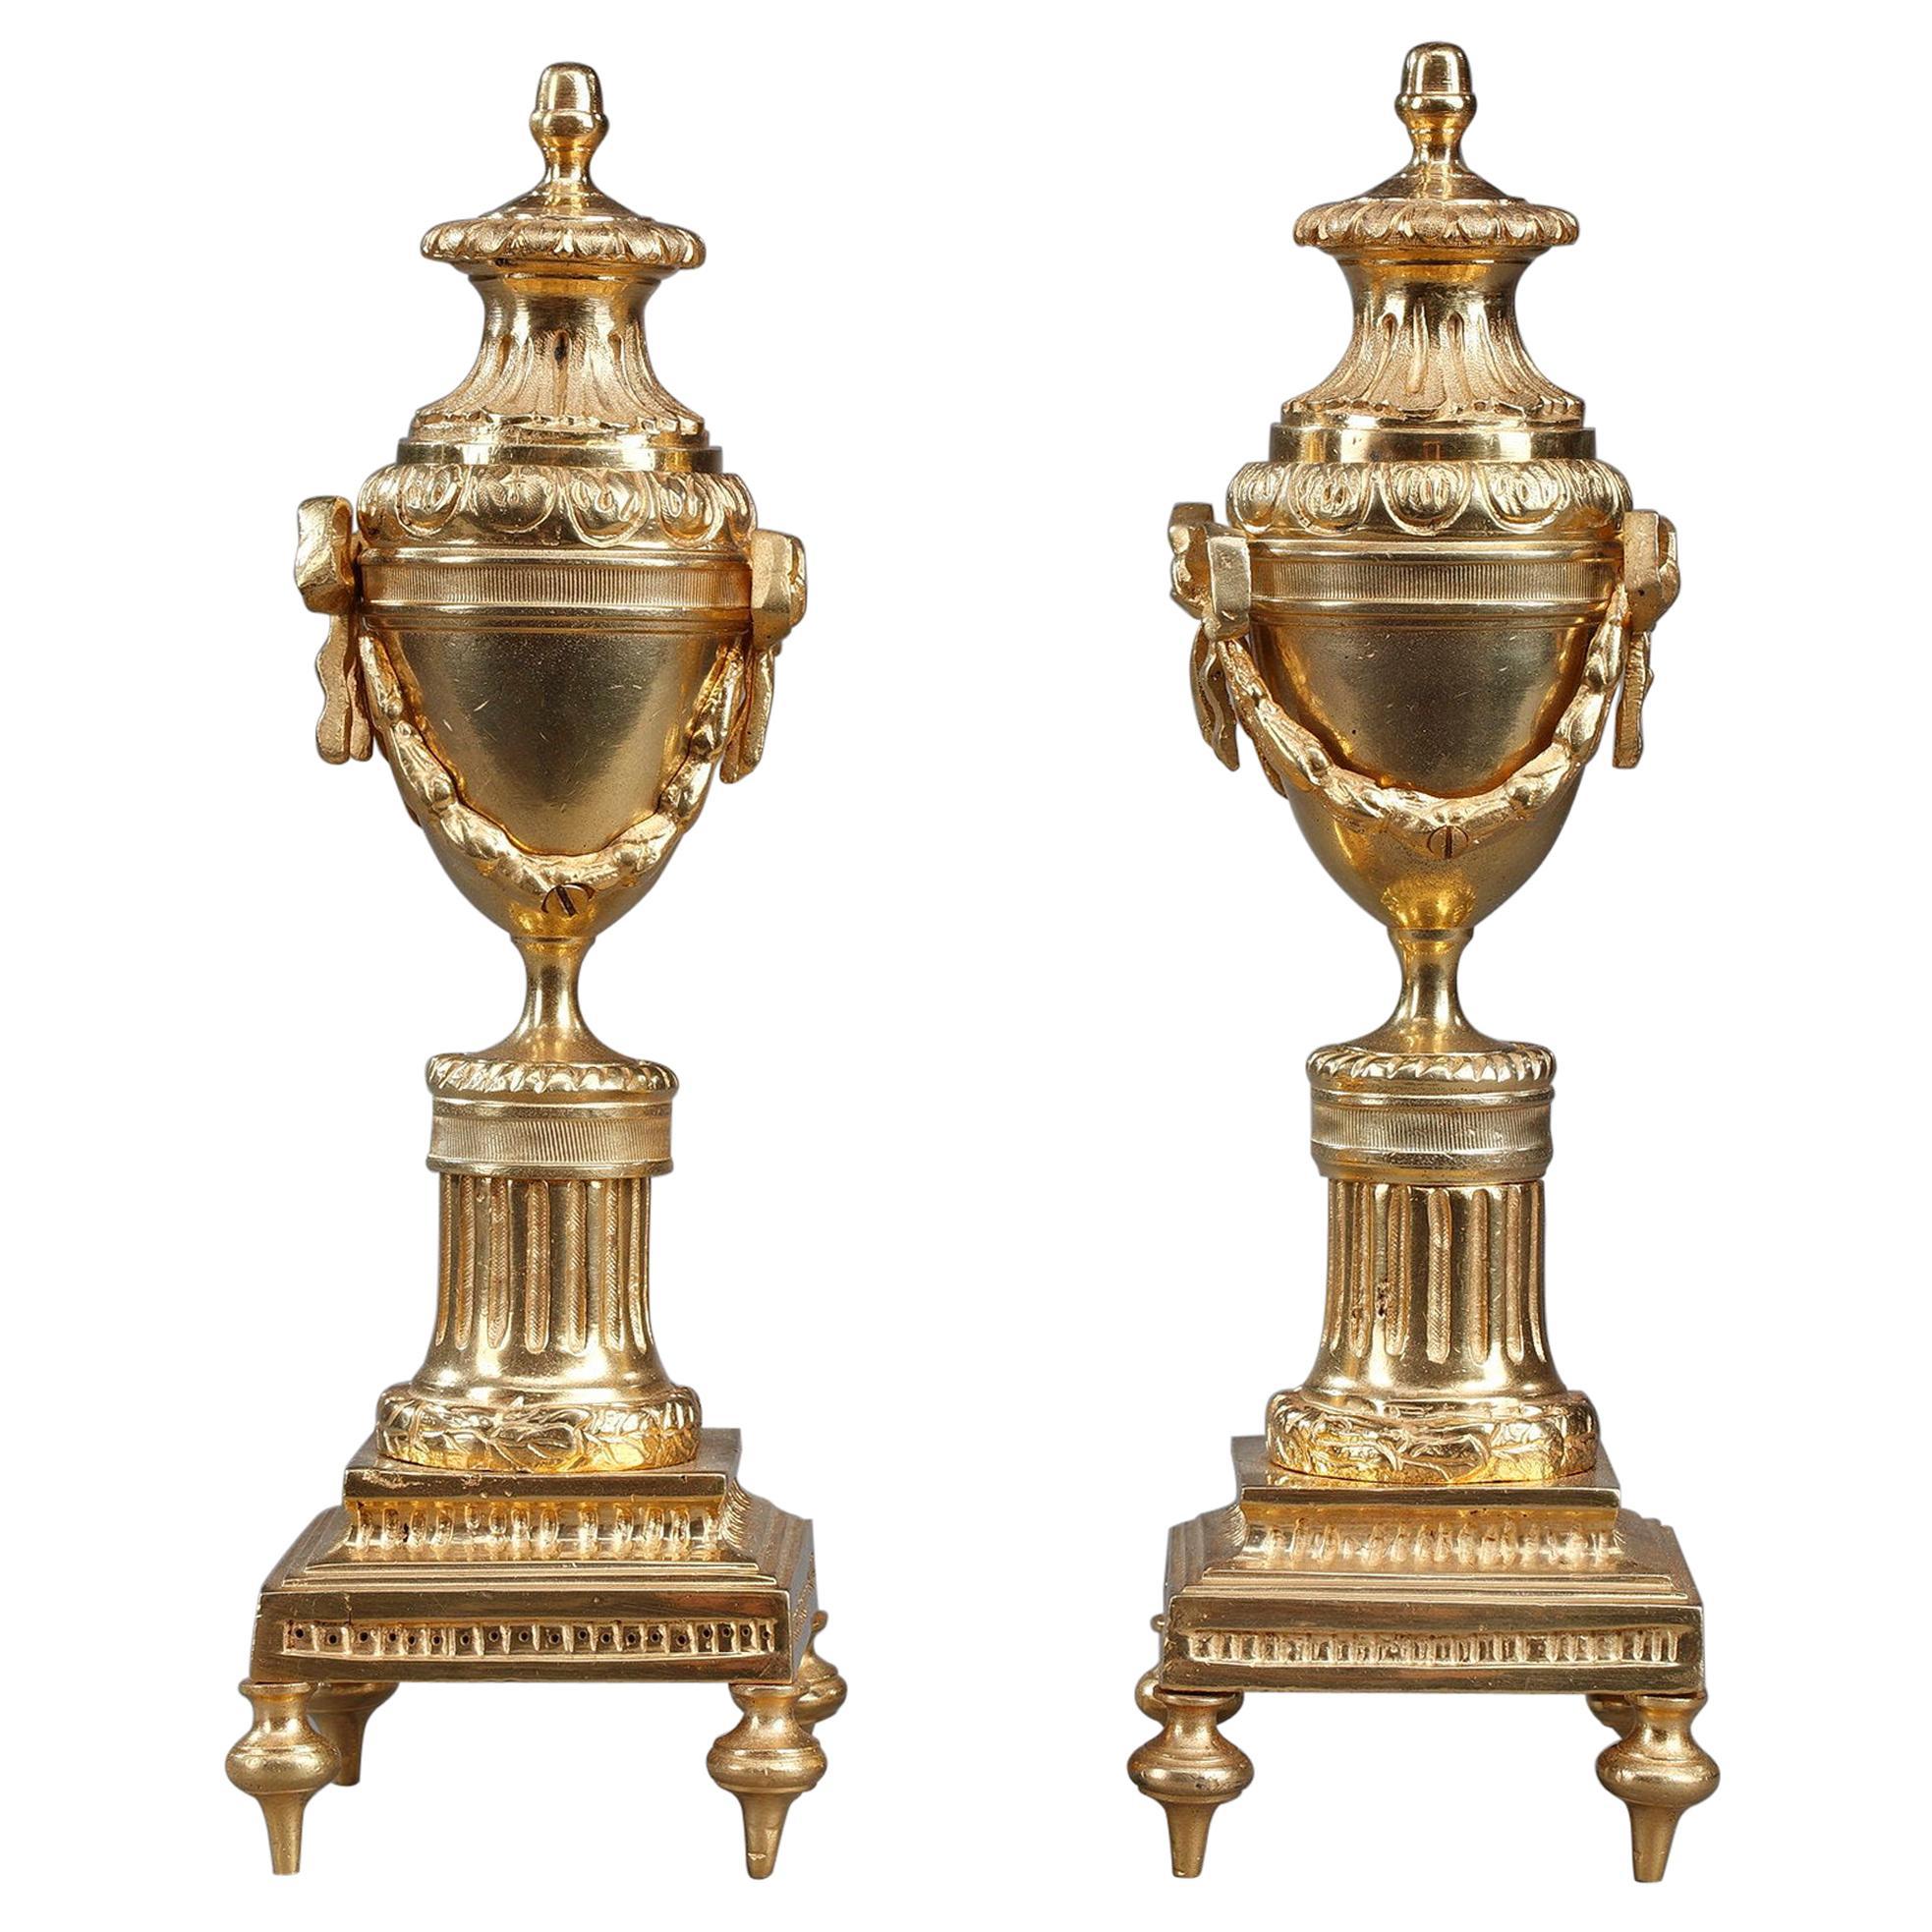 Pair of Louis XVI Style Cassolettes